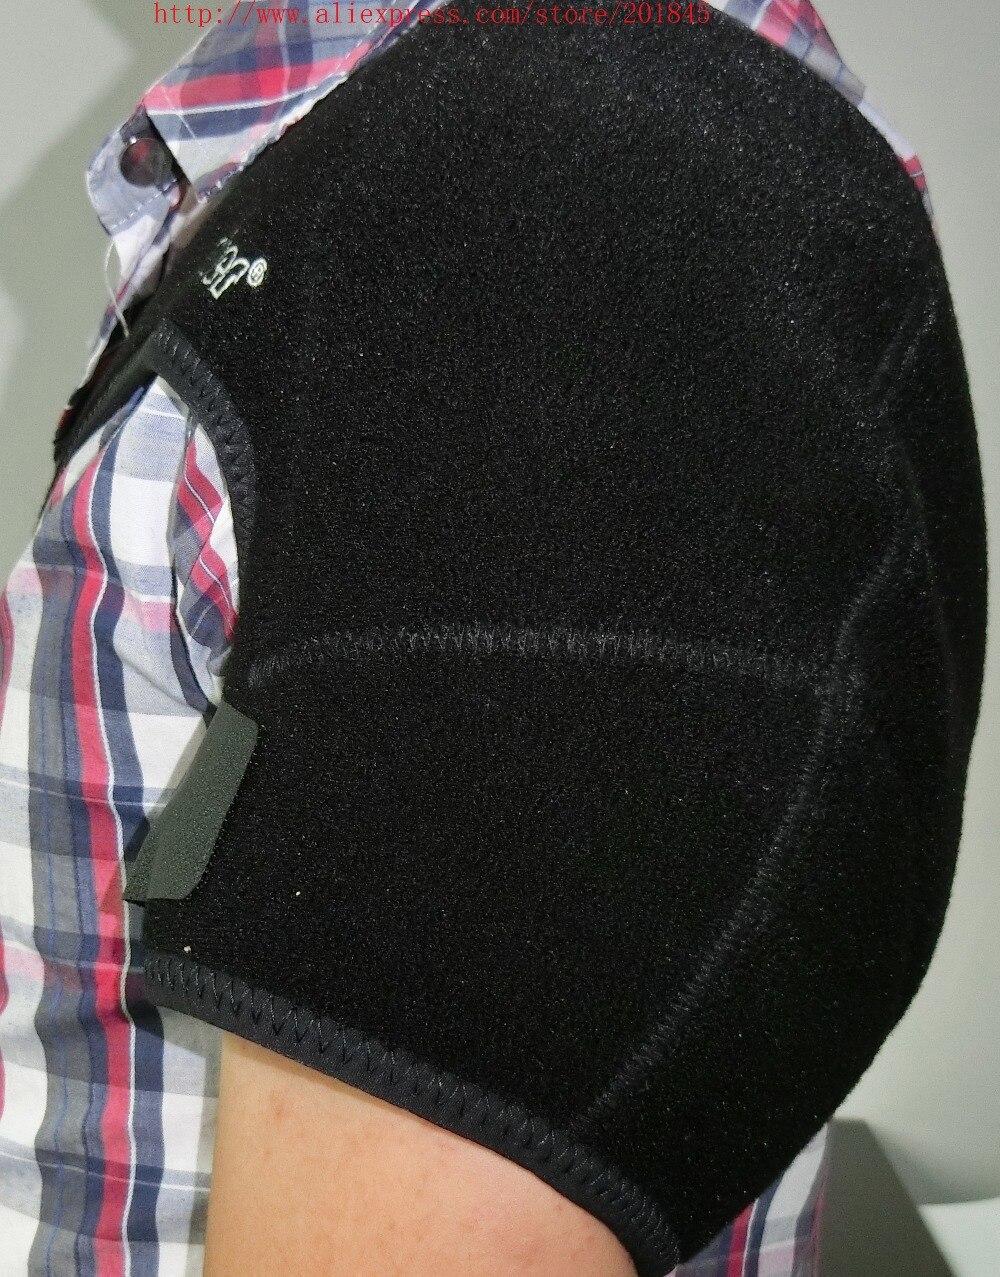 купить Adjustable Left Shoulder Bandage Protector Brace Joint Pain Injury Dislocation Arthritis Shoulder Arm Support Strap Equipment по цене 4404.2 рублей